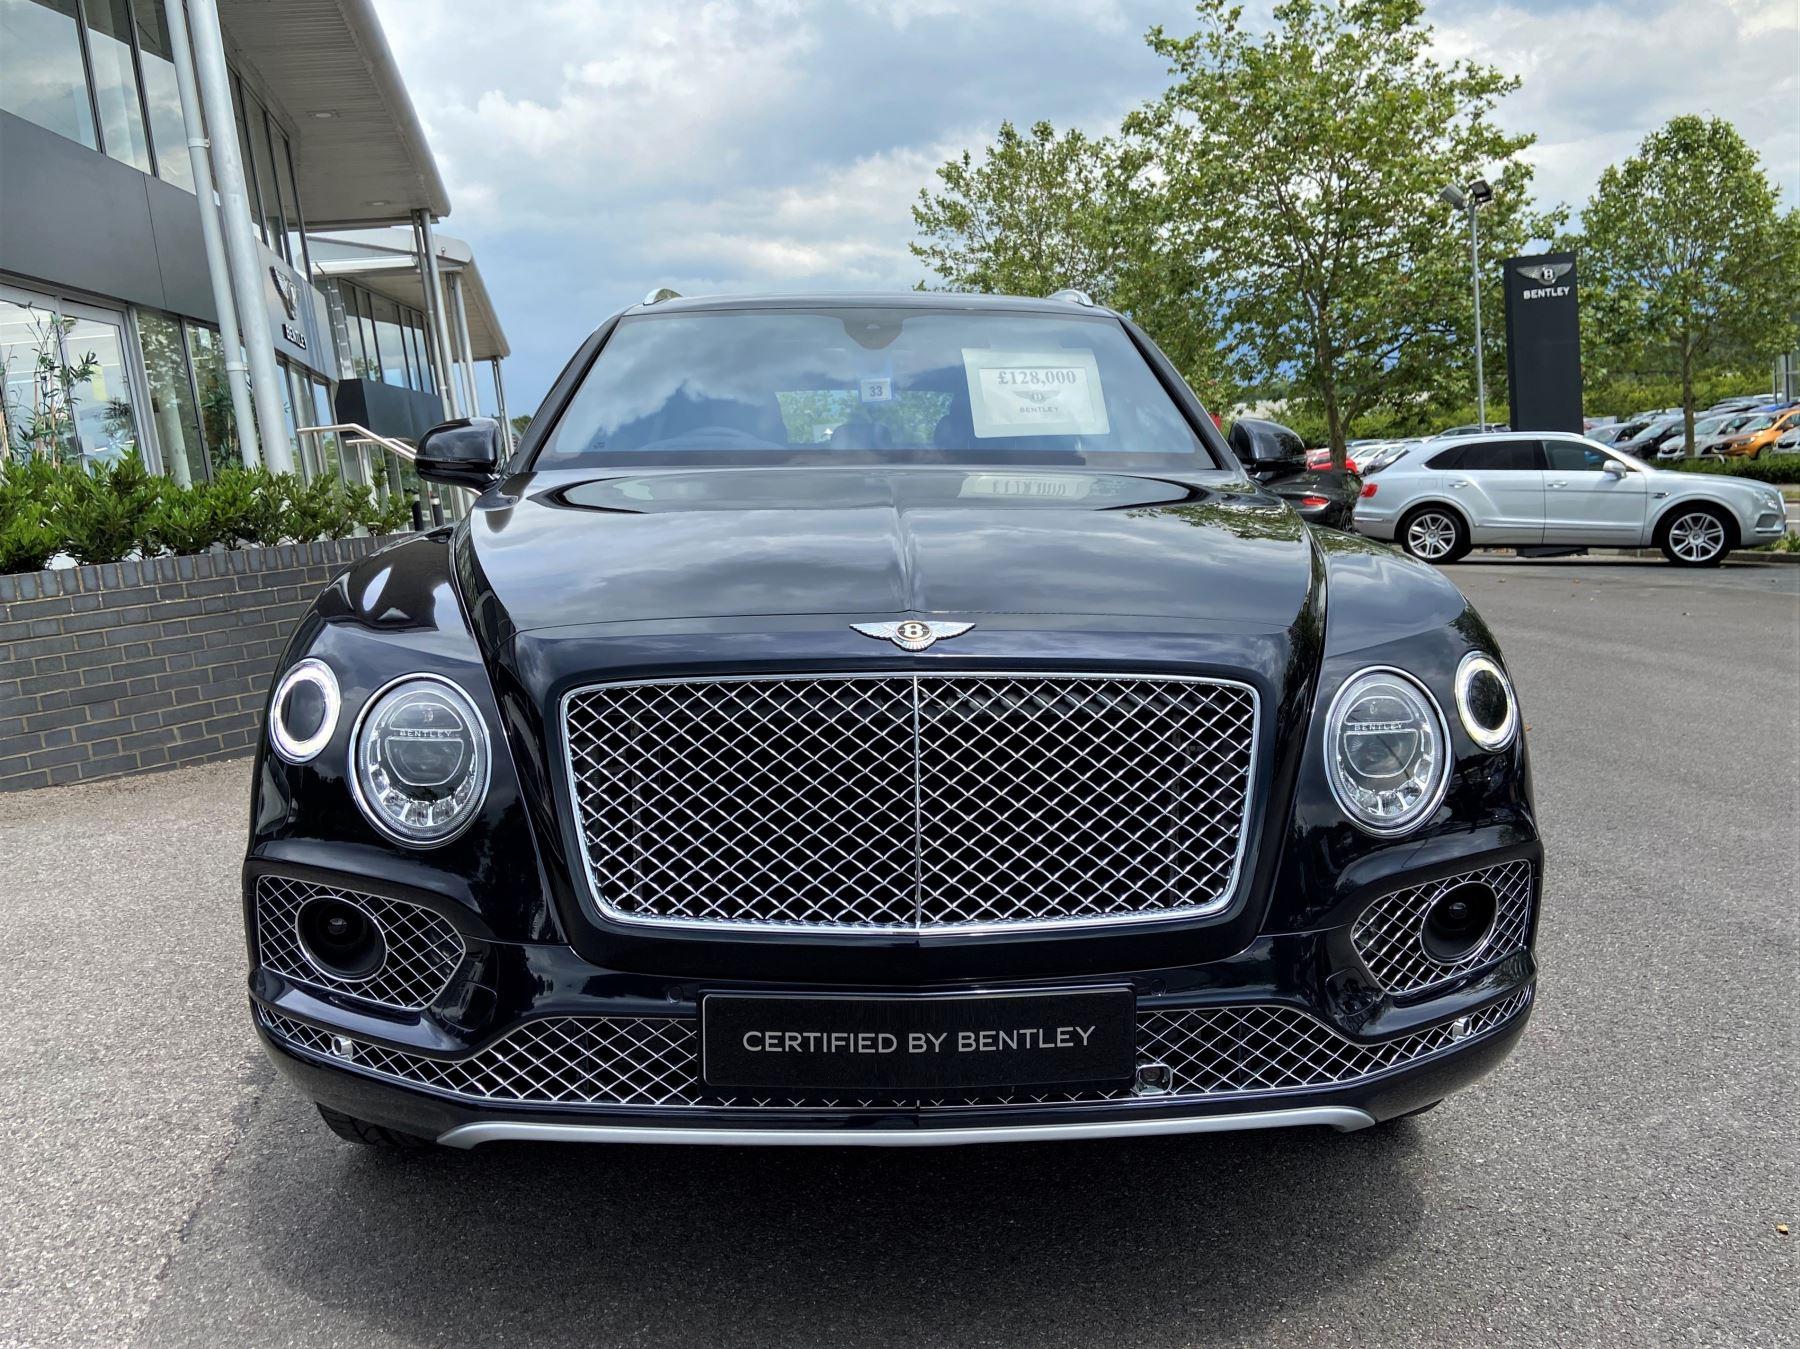 Bentley Bentayga 4.0 V8 5dr Mulliner Driving Specification Automatic Estate (2019)